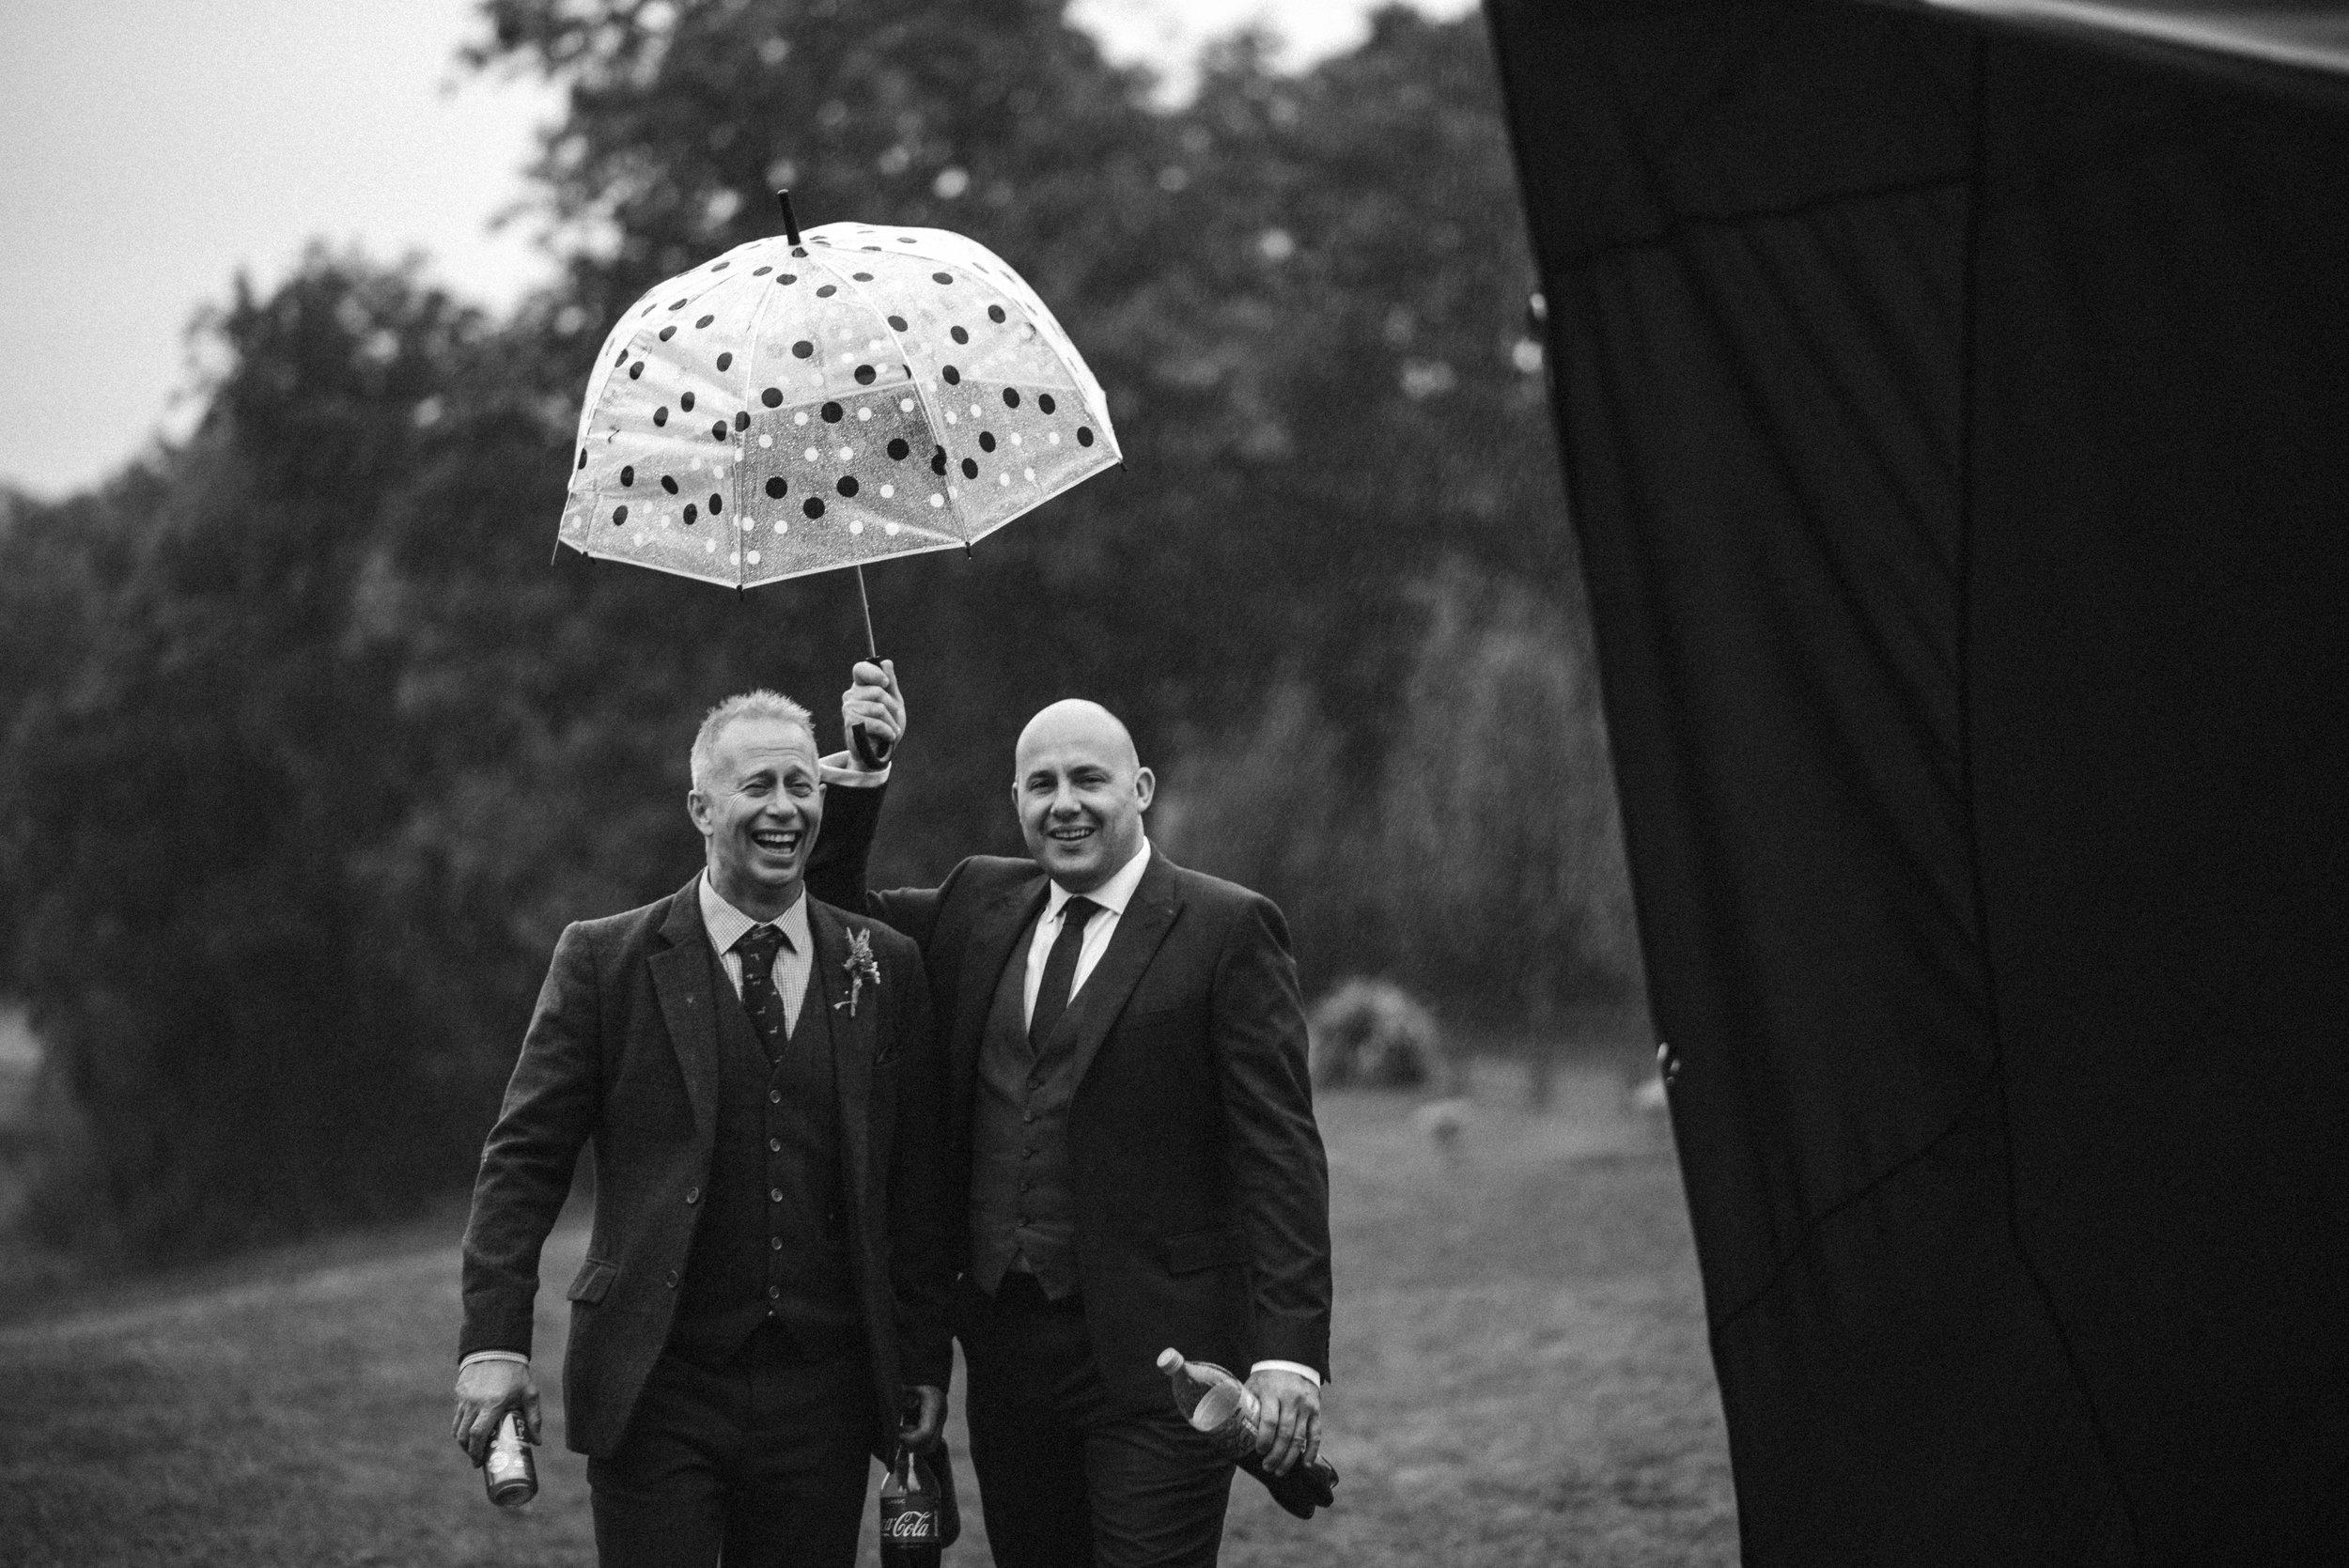 pengenna-manor-wedding-photographer-79.jpg